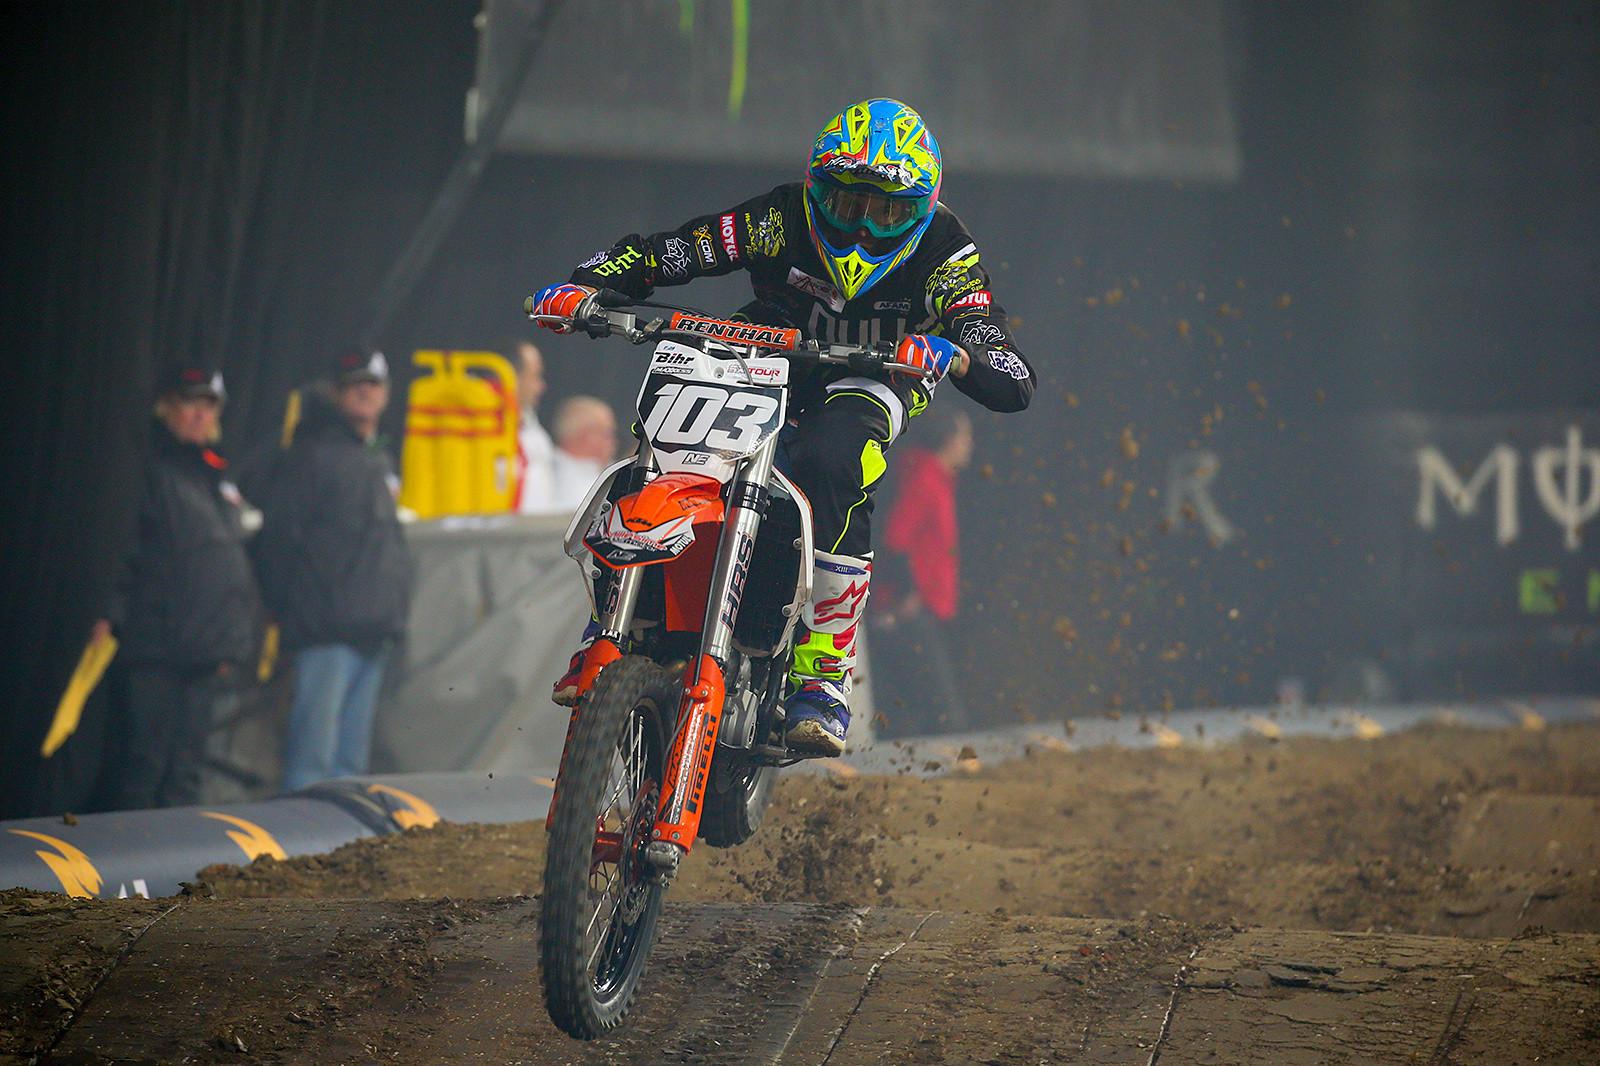 Dan Houzet - Photo Gallery: Saturday at the Paris-Lille Supercross - Motocross Pictures - Vital MX